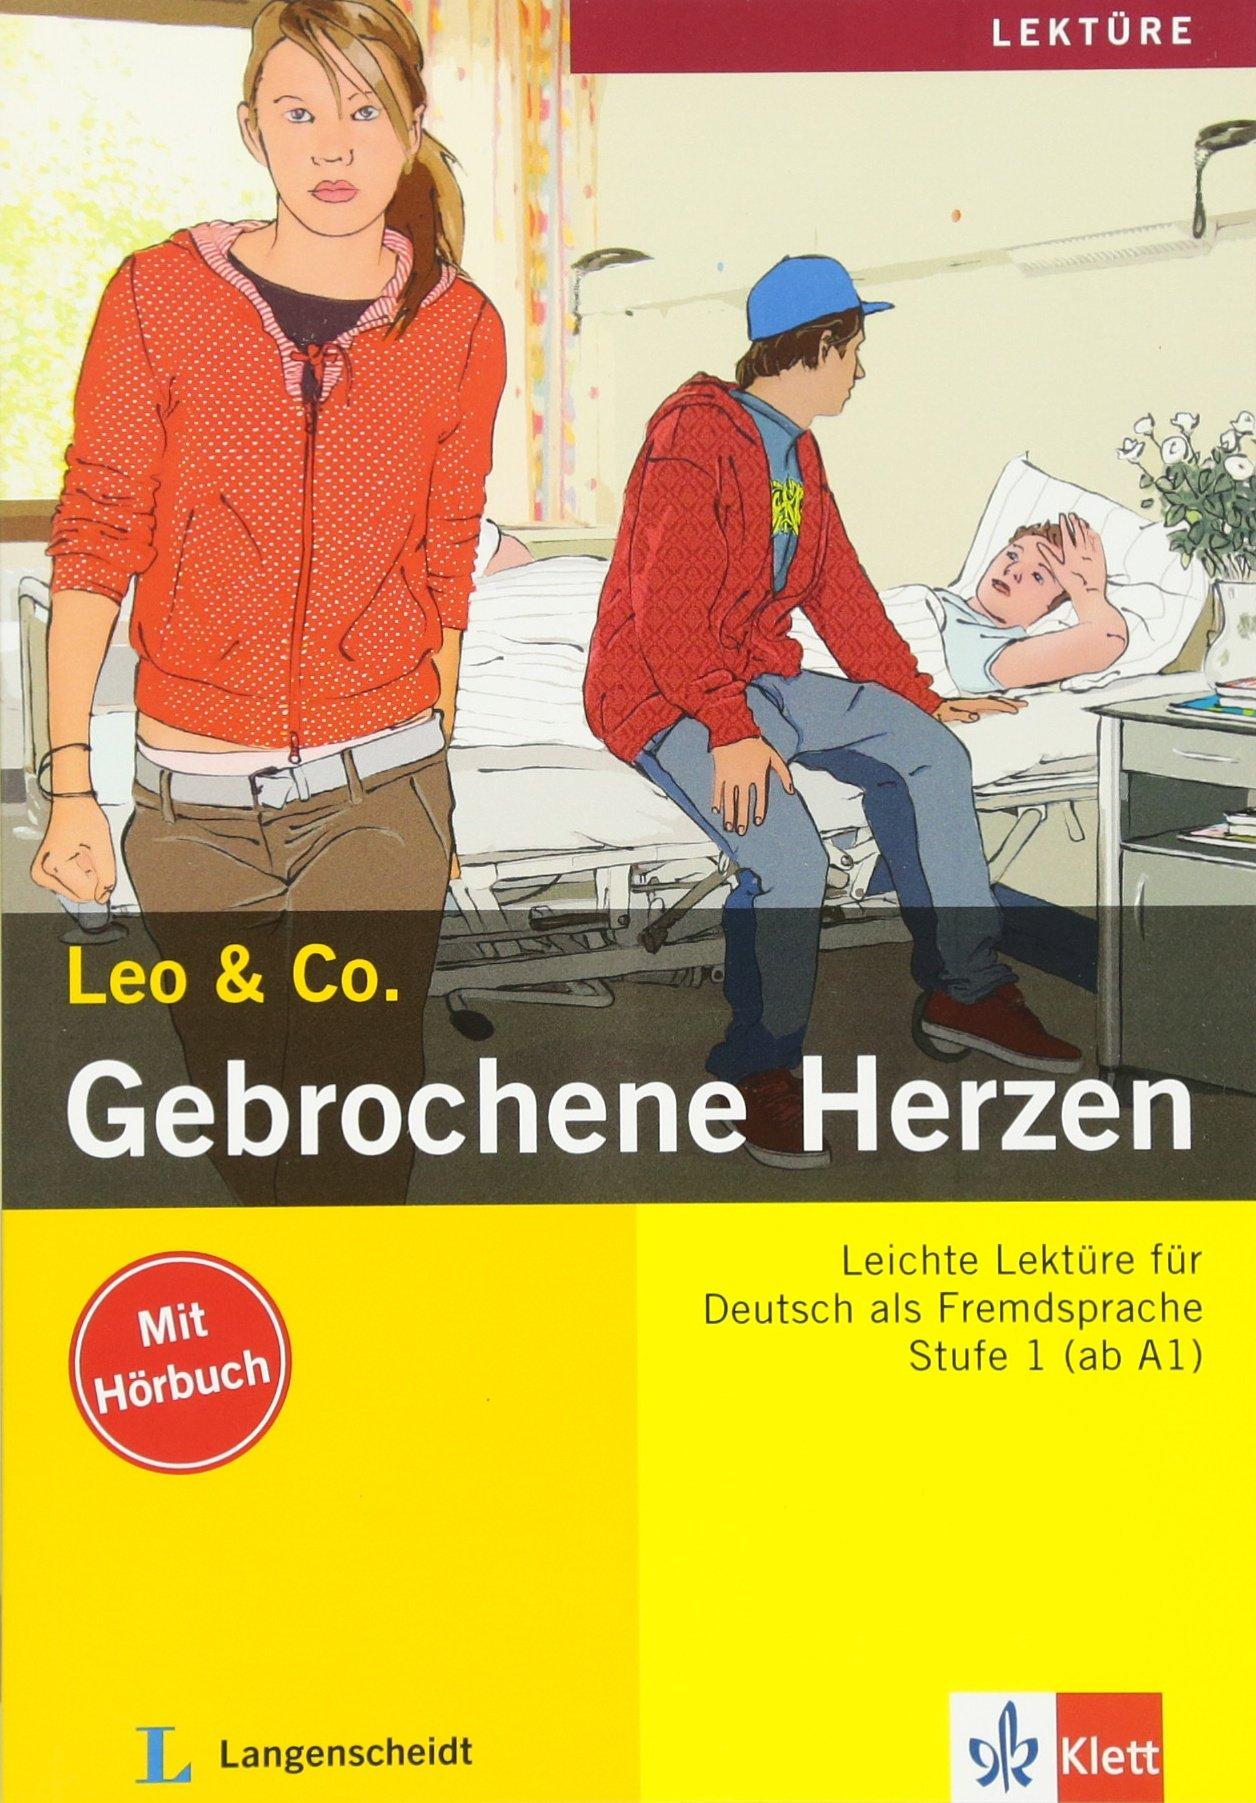 Leo & Co.: Gebrochene Herzen (German Edition) ebook